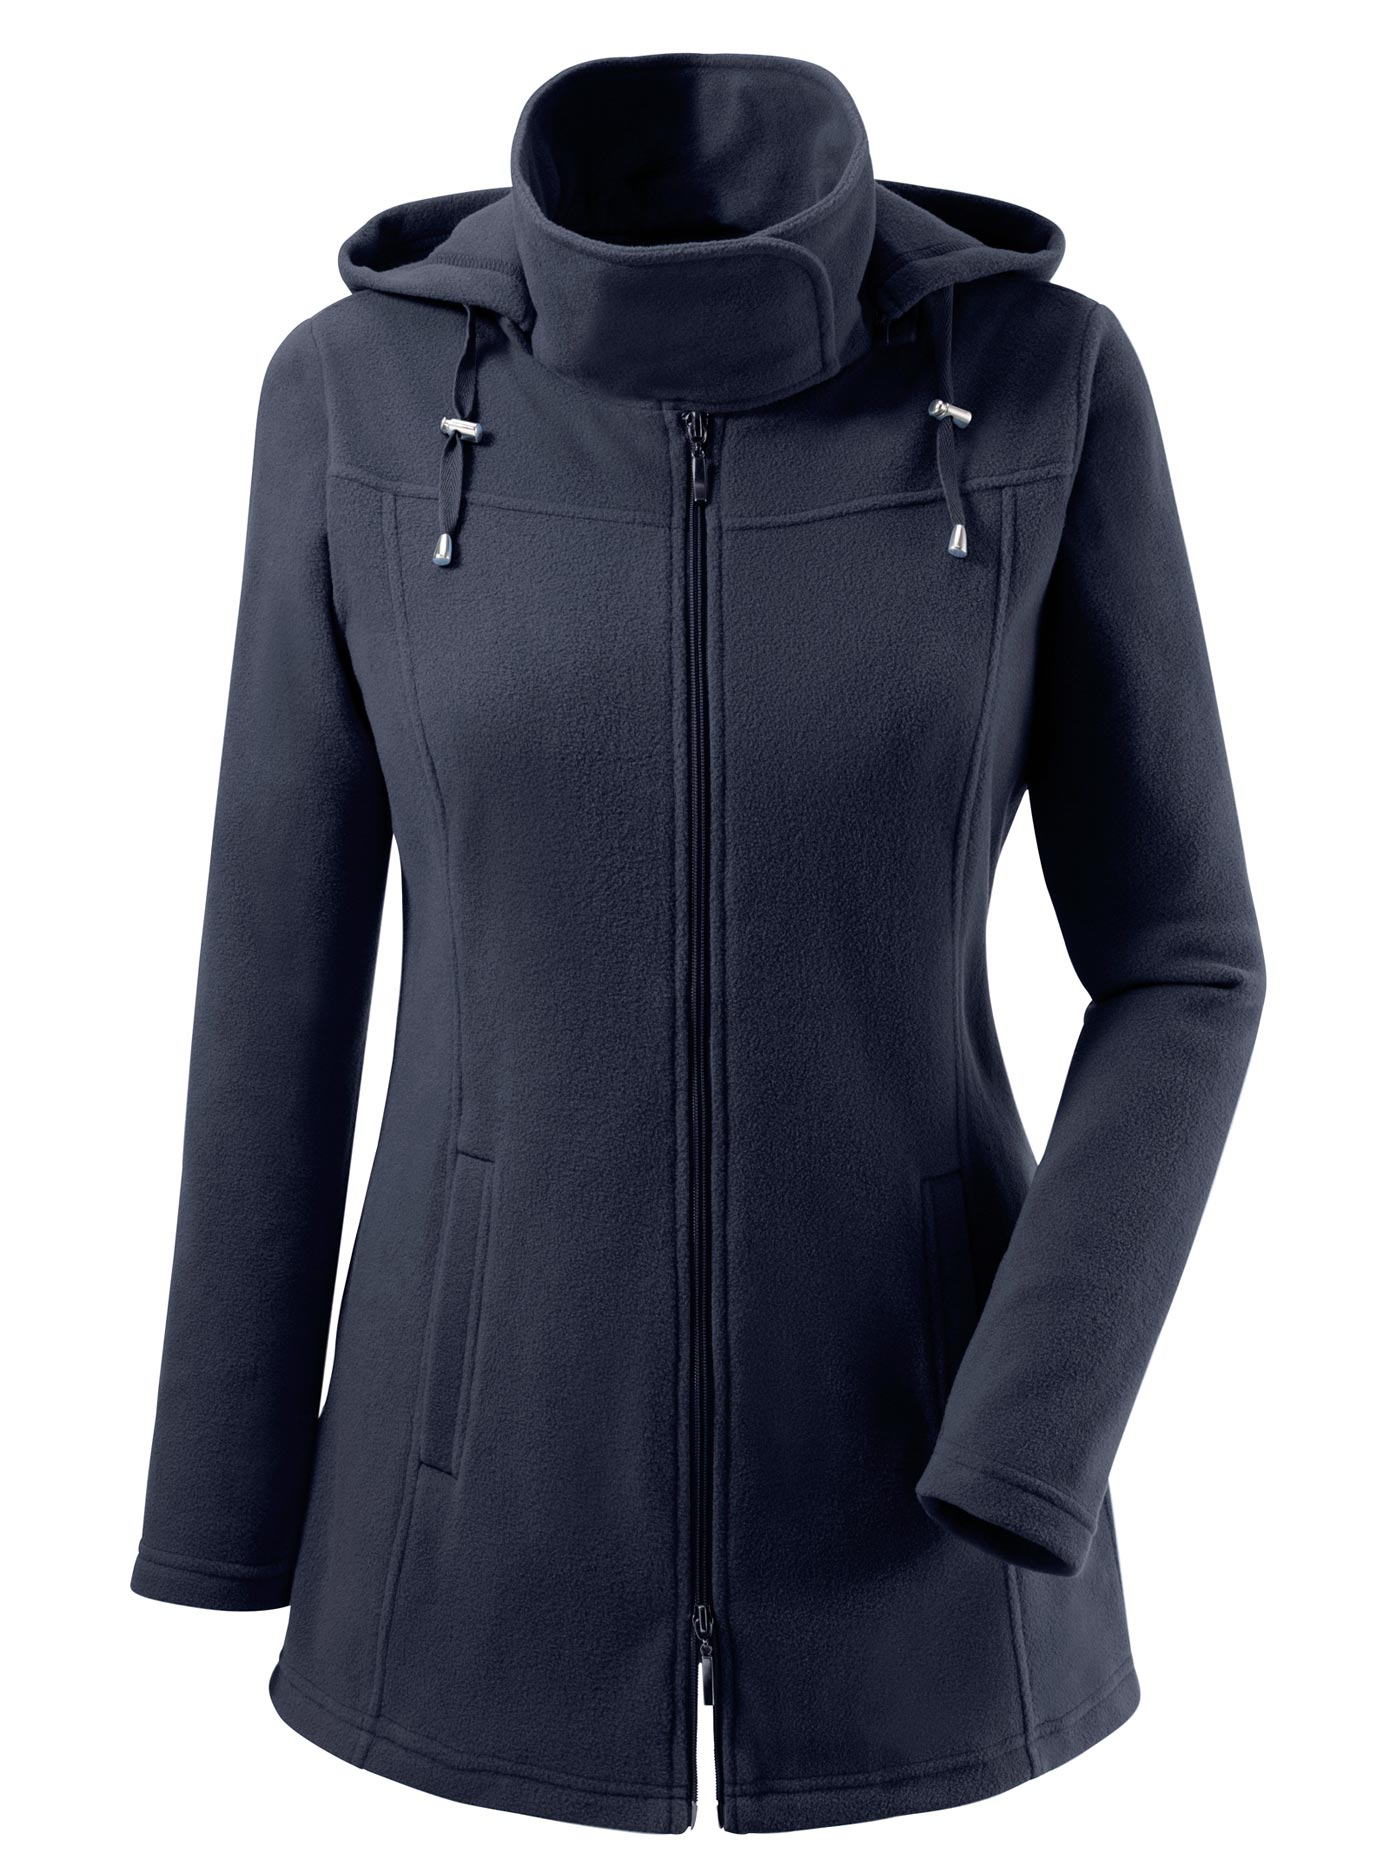 Casual Looks Fleece-Jacke mit Kordelstopper | Bekleidung > Jacken > Fleecejacken | Blau | Fleece | Casual Looks